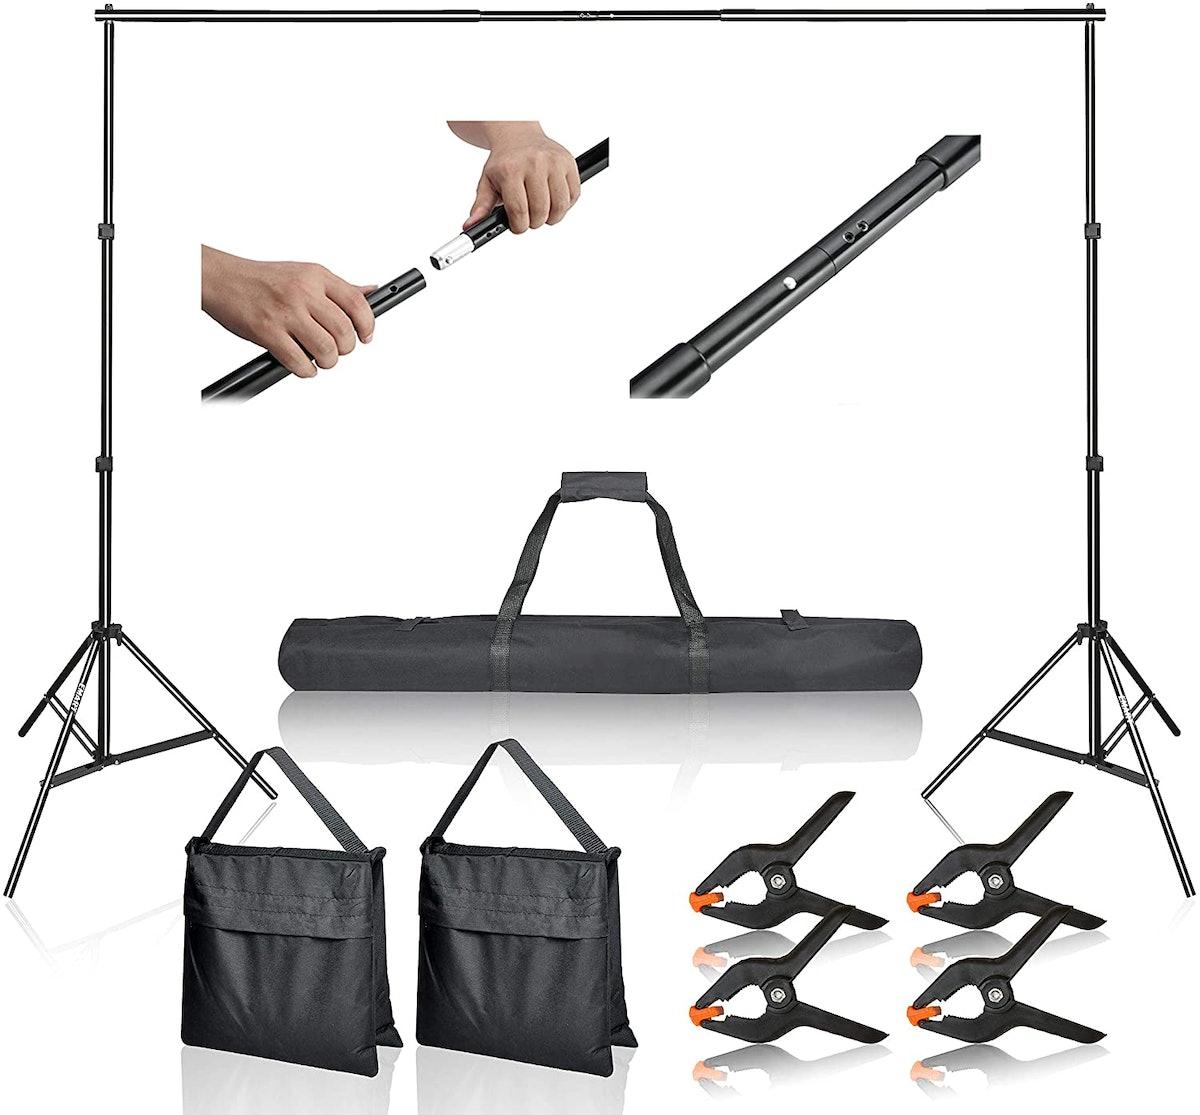 EMART Photo Video Studio 10 ft. Adjustable Background Stand